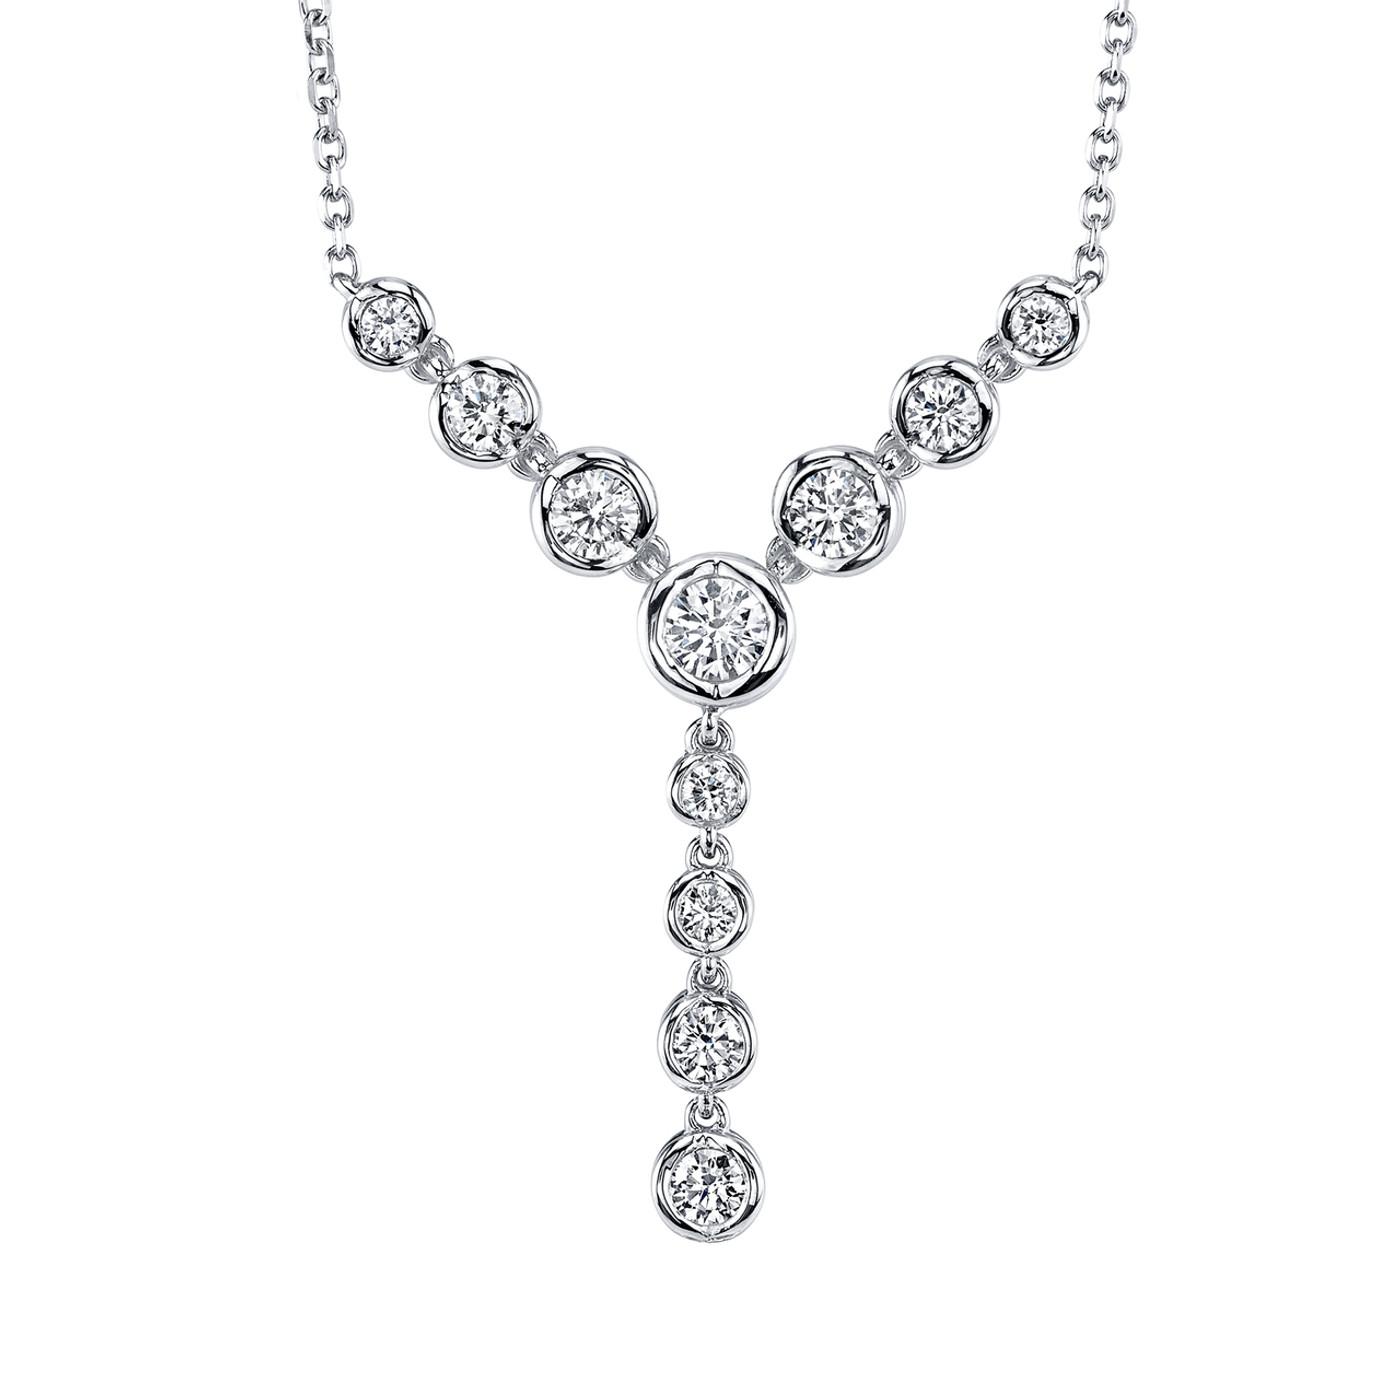 14 Karat White Gold .50DTW Bezel Dangle Sirena Pendant with Adjustable Chain